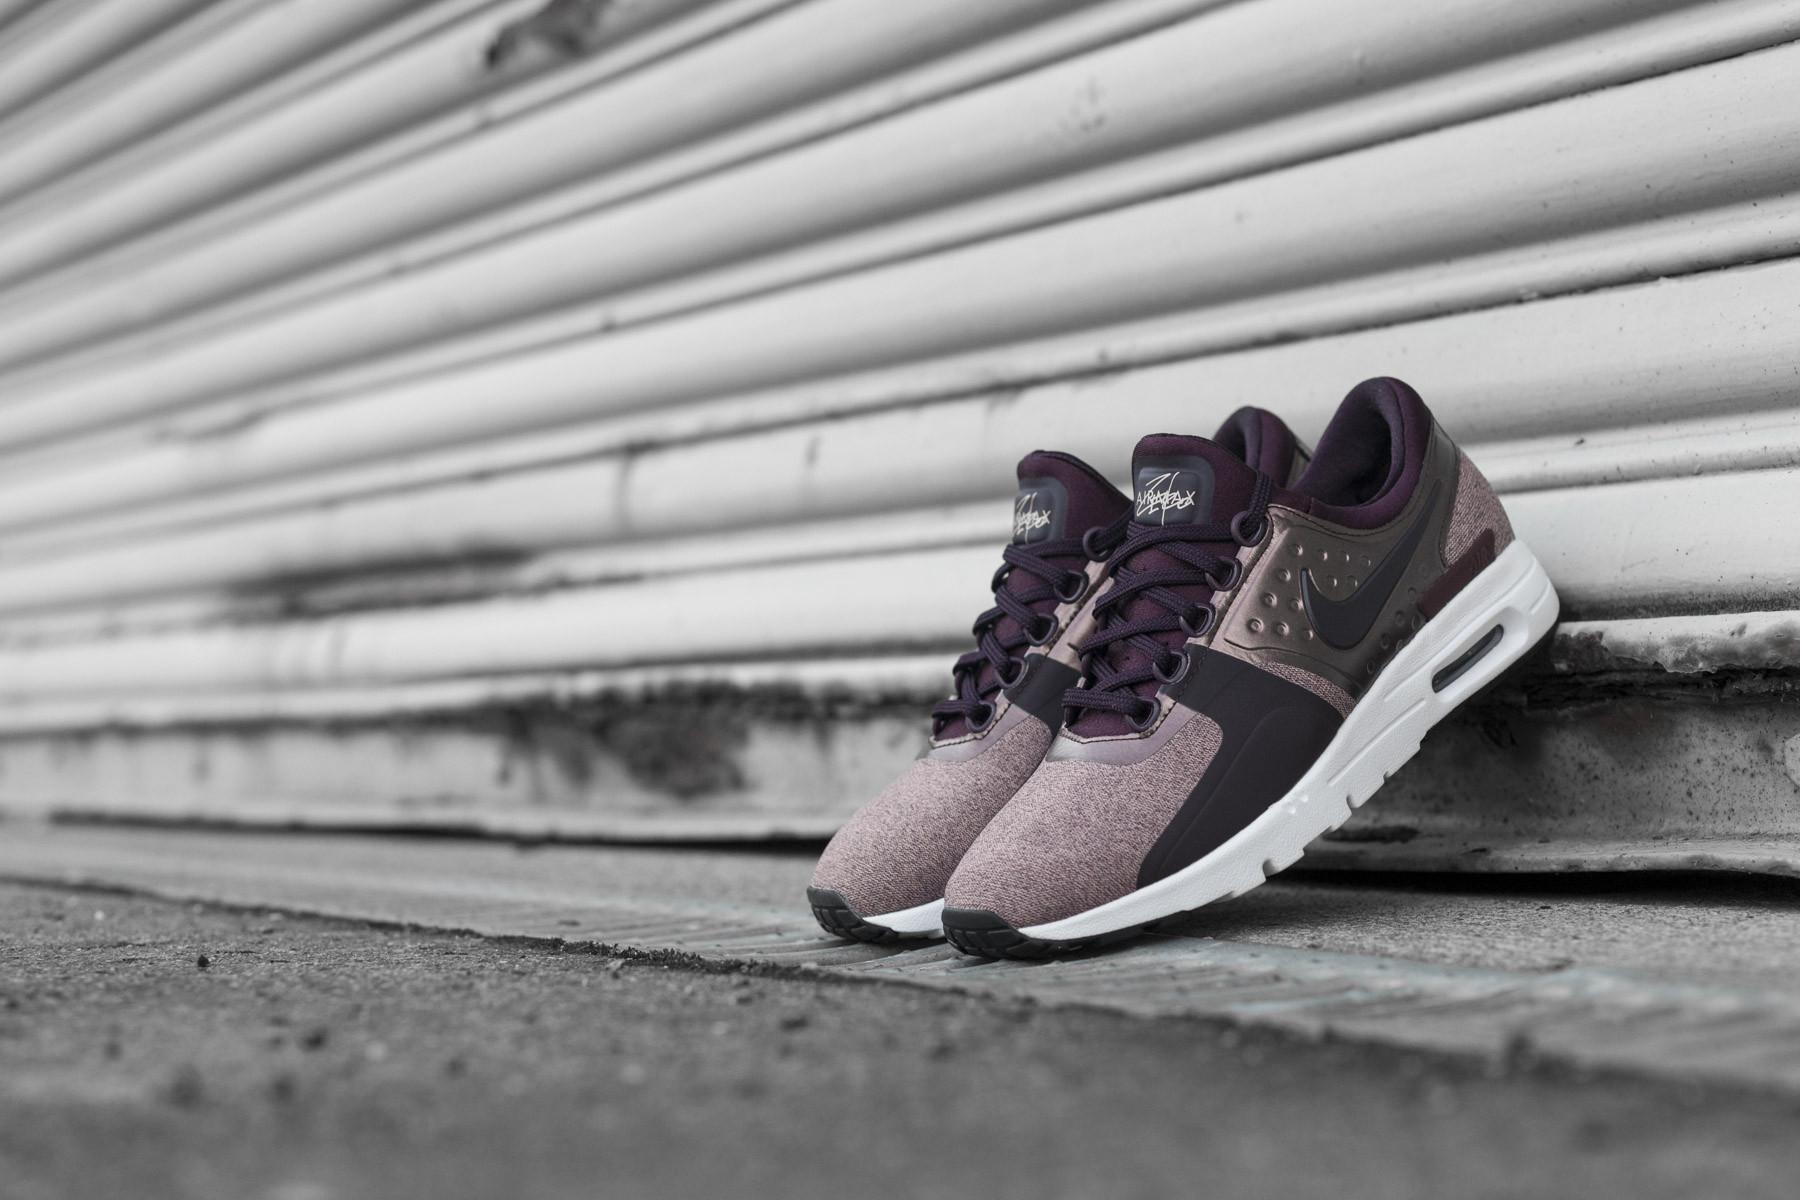 89d62923c4 ... cheap w nike air max zero prm sneakers sneaker.no 7038d 9c99c